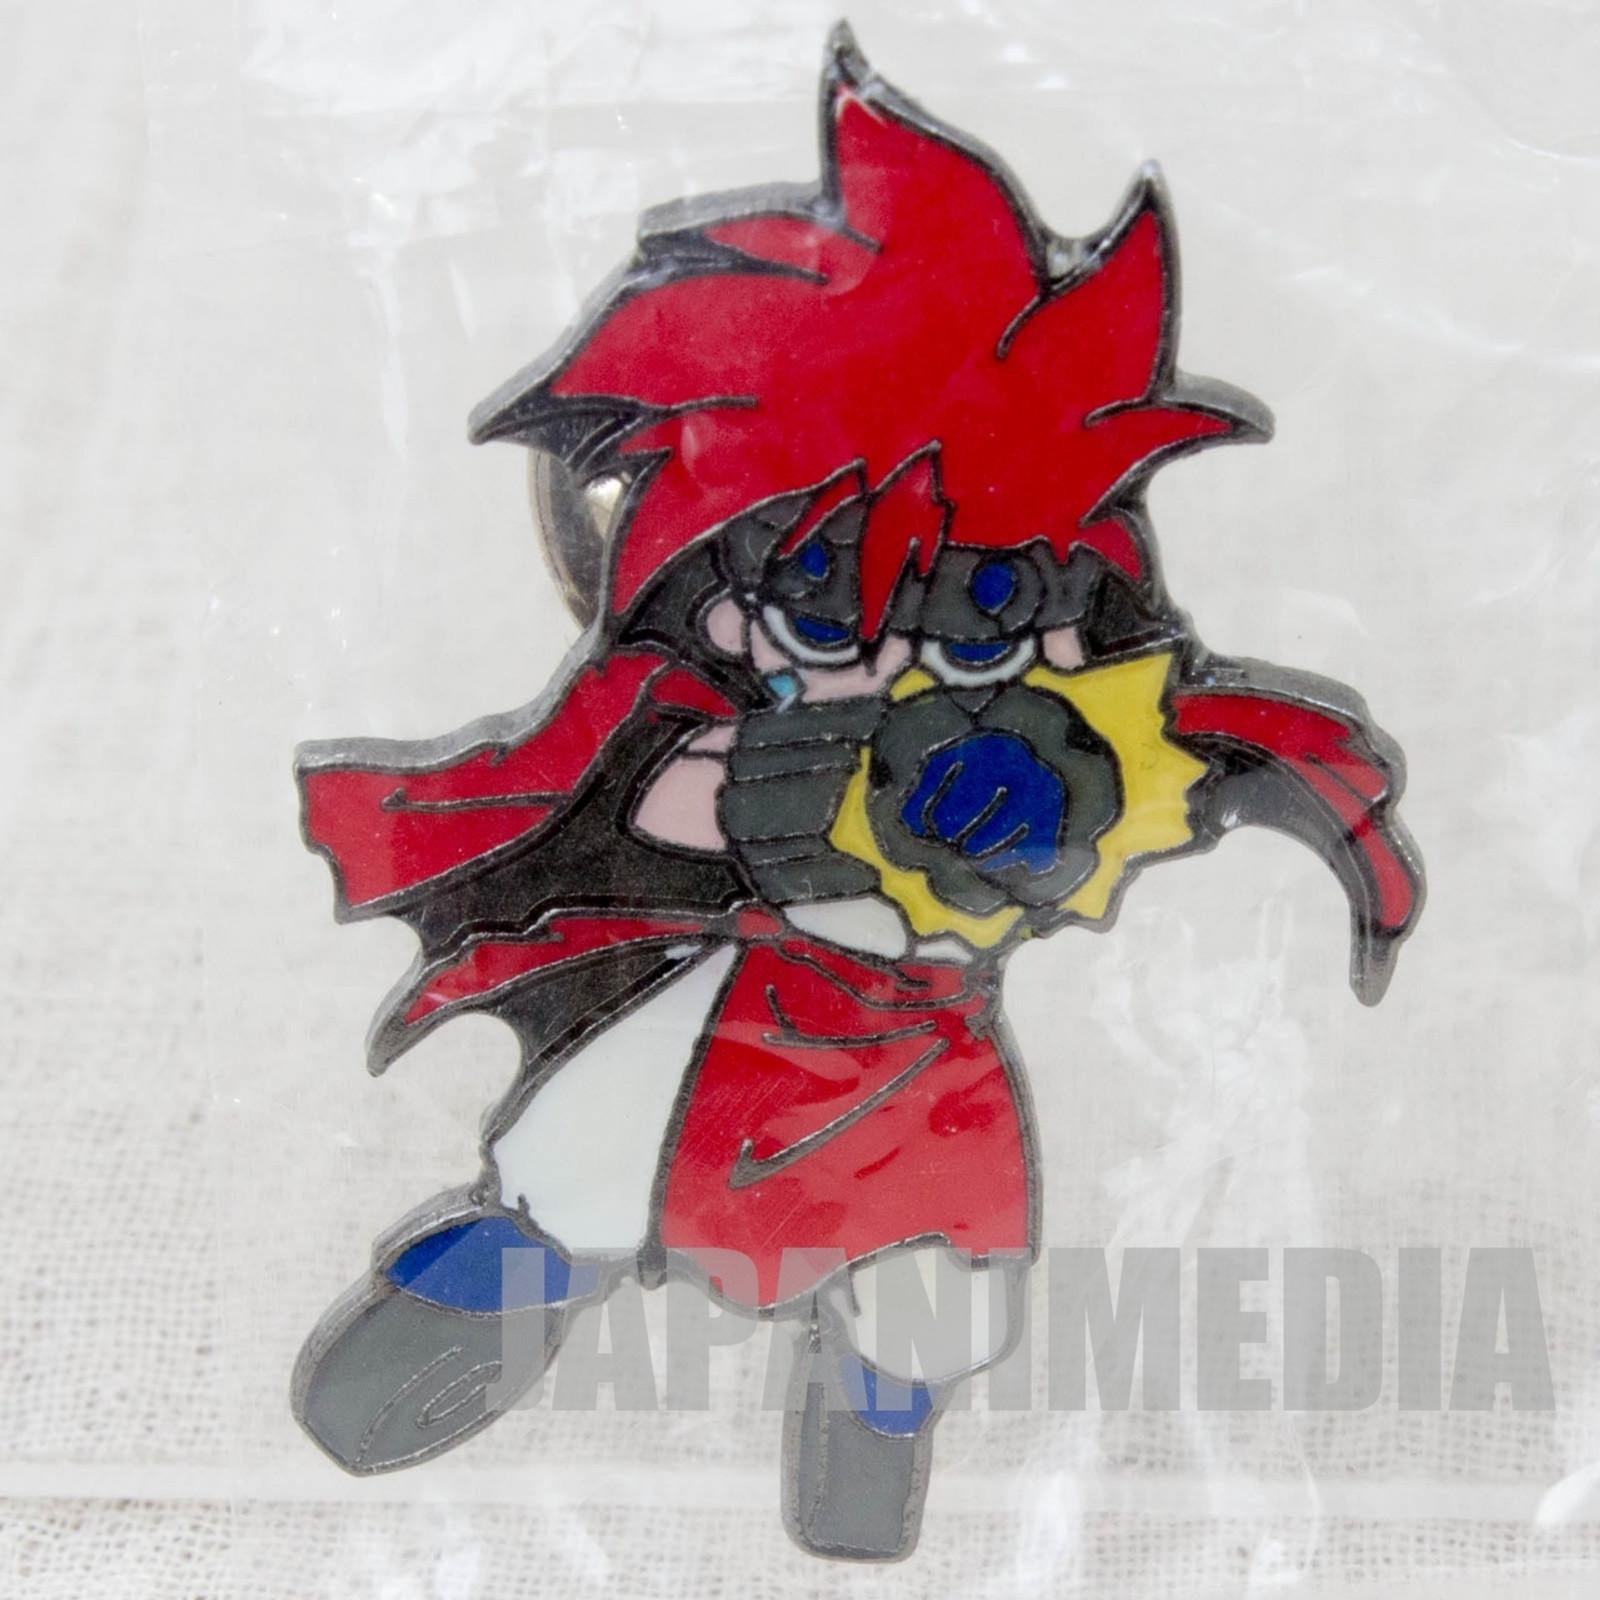 Senkaiden Hoshin Engi Nataku Mini Metal Pins JAPAN ANIME MANGA 3